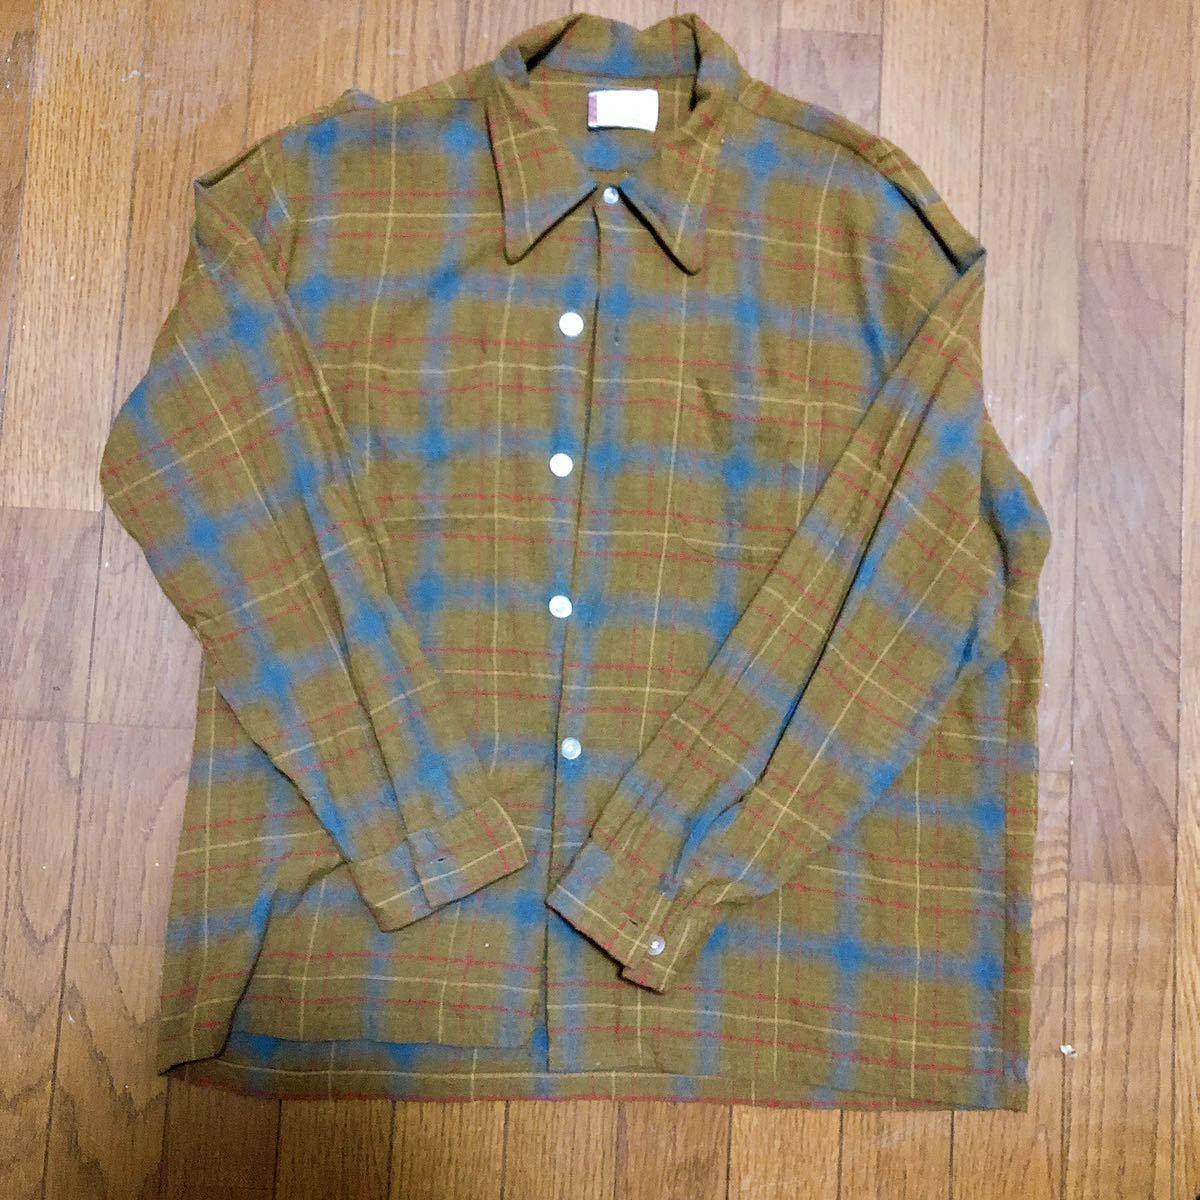 Vintage レーヨン チェックシャツ XL 長袖シャツ チェックシャツ ビンテージ タウンクラフト_画像1